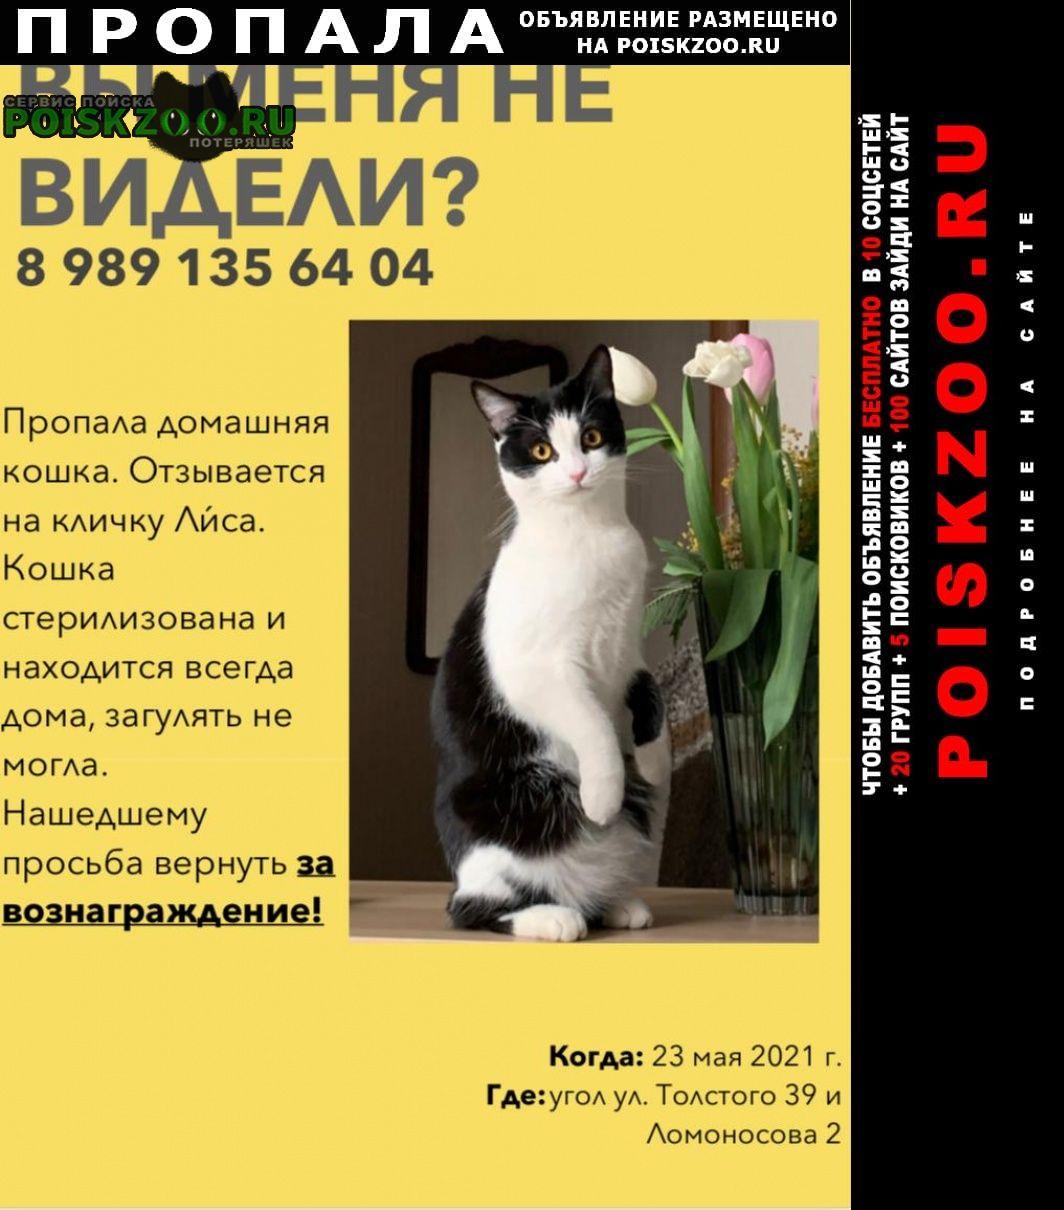 Пропала кошка Владикавказ